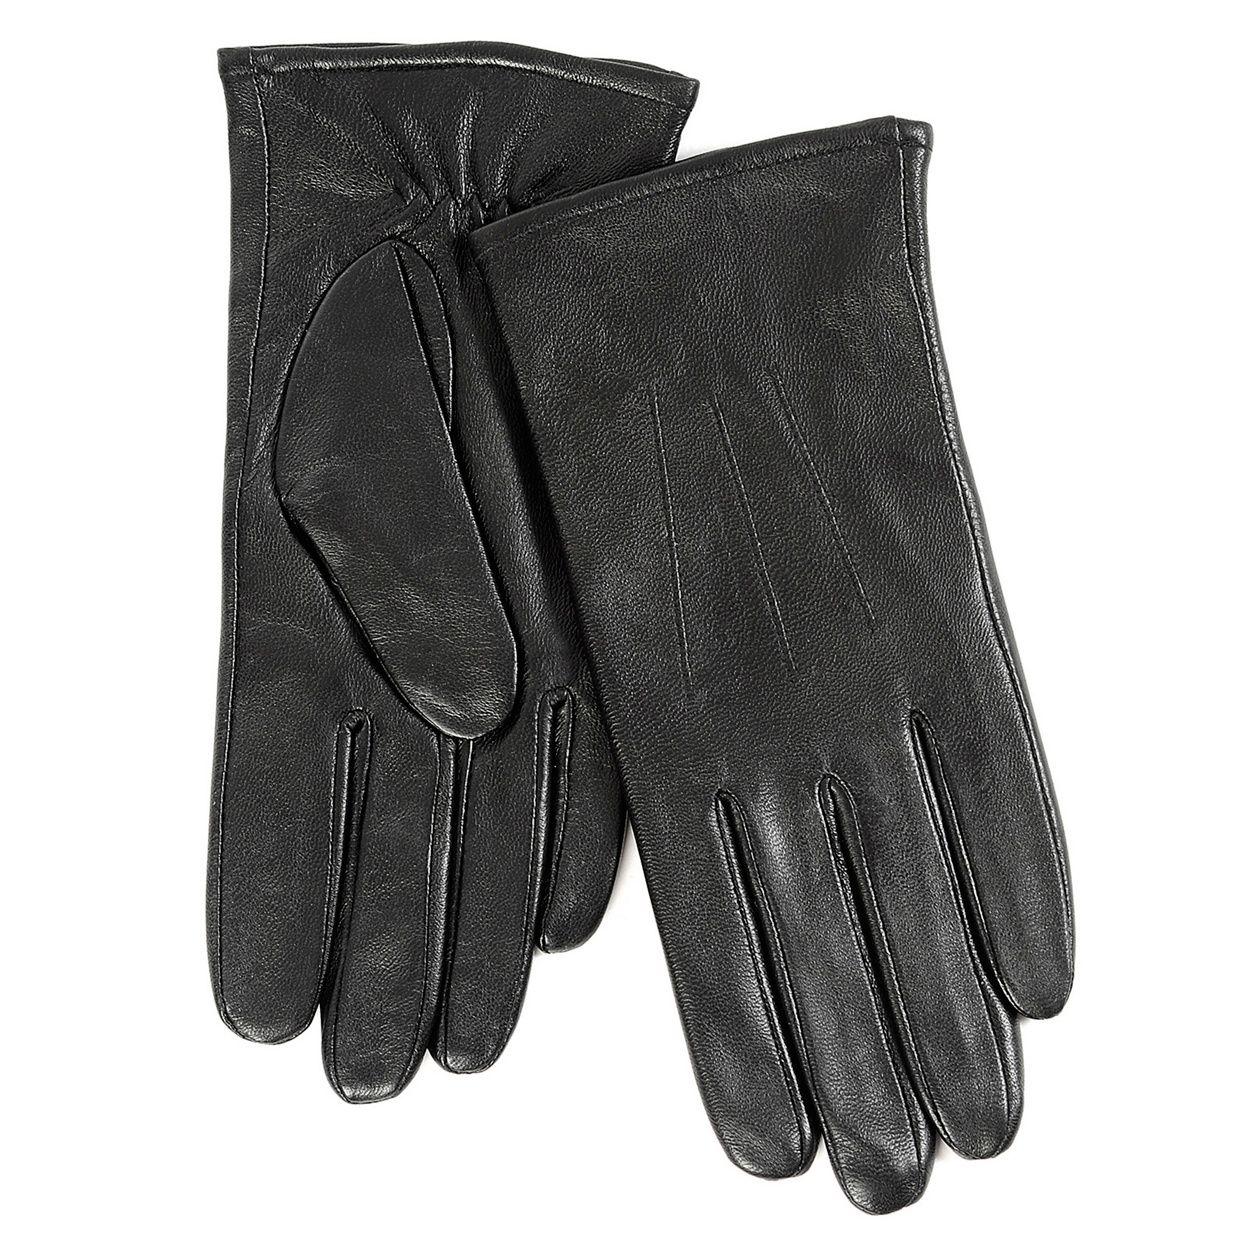 Ladies leather gloves isotoner - Isotoner Ladies Black 3 Point Leather Glove